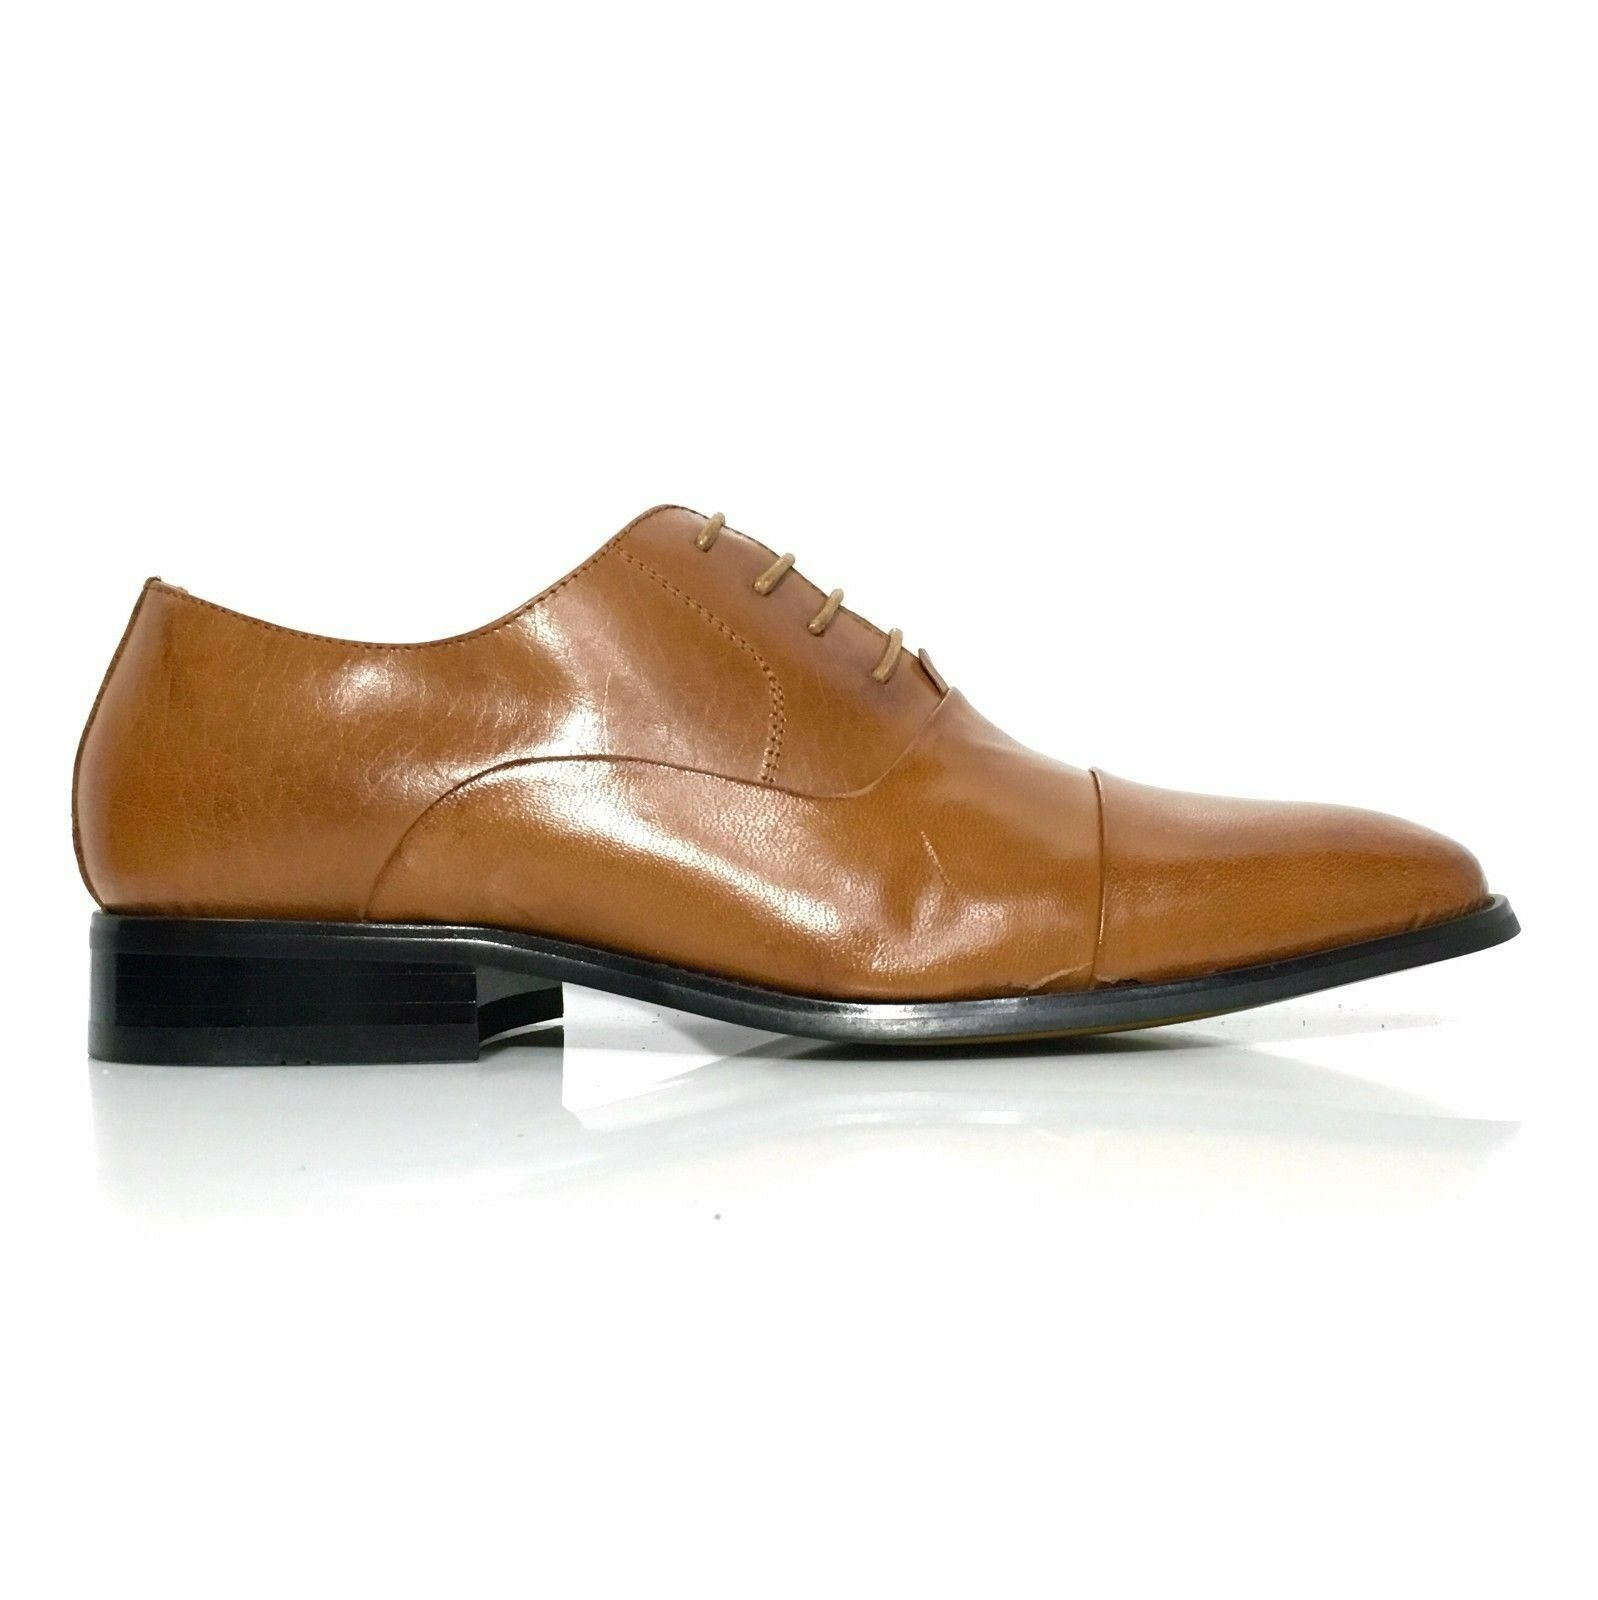 La Milano Men's Leather Round Cap Toe Oxford Lace Up Dress shoes Style F591 Tan